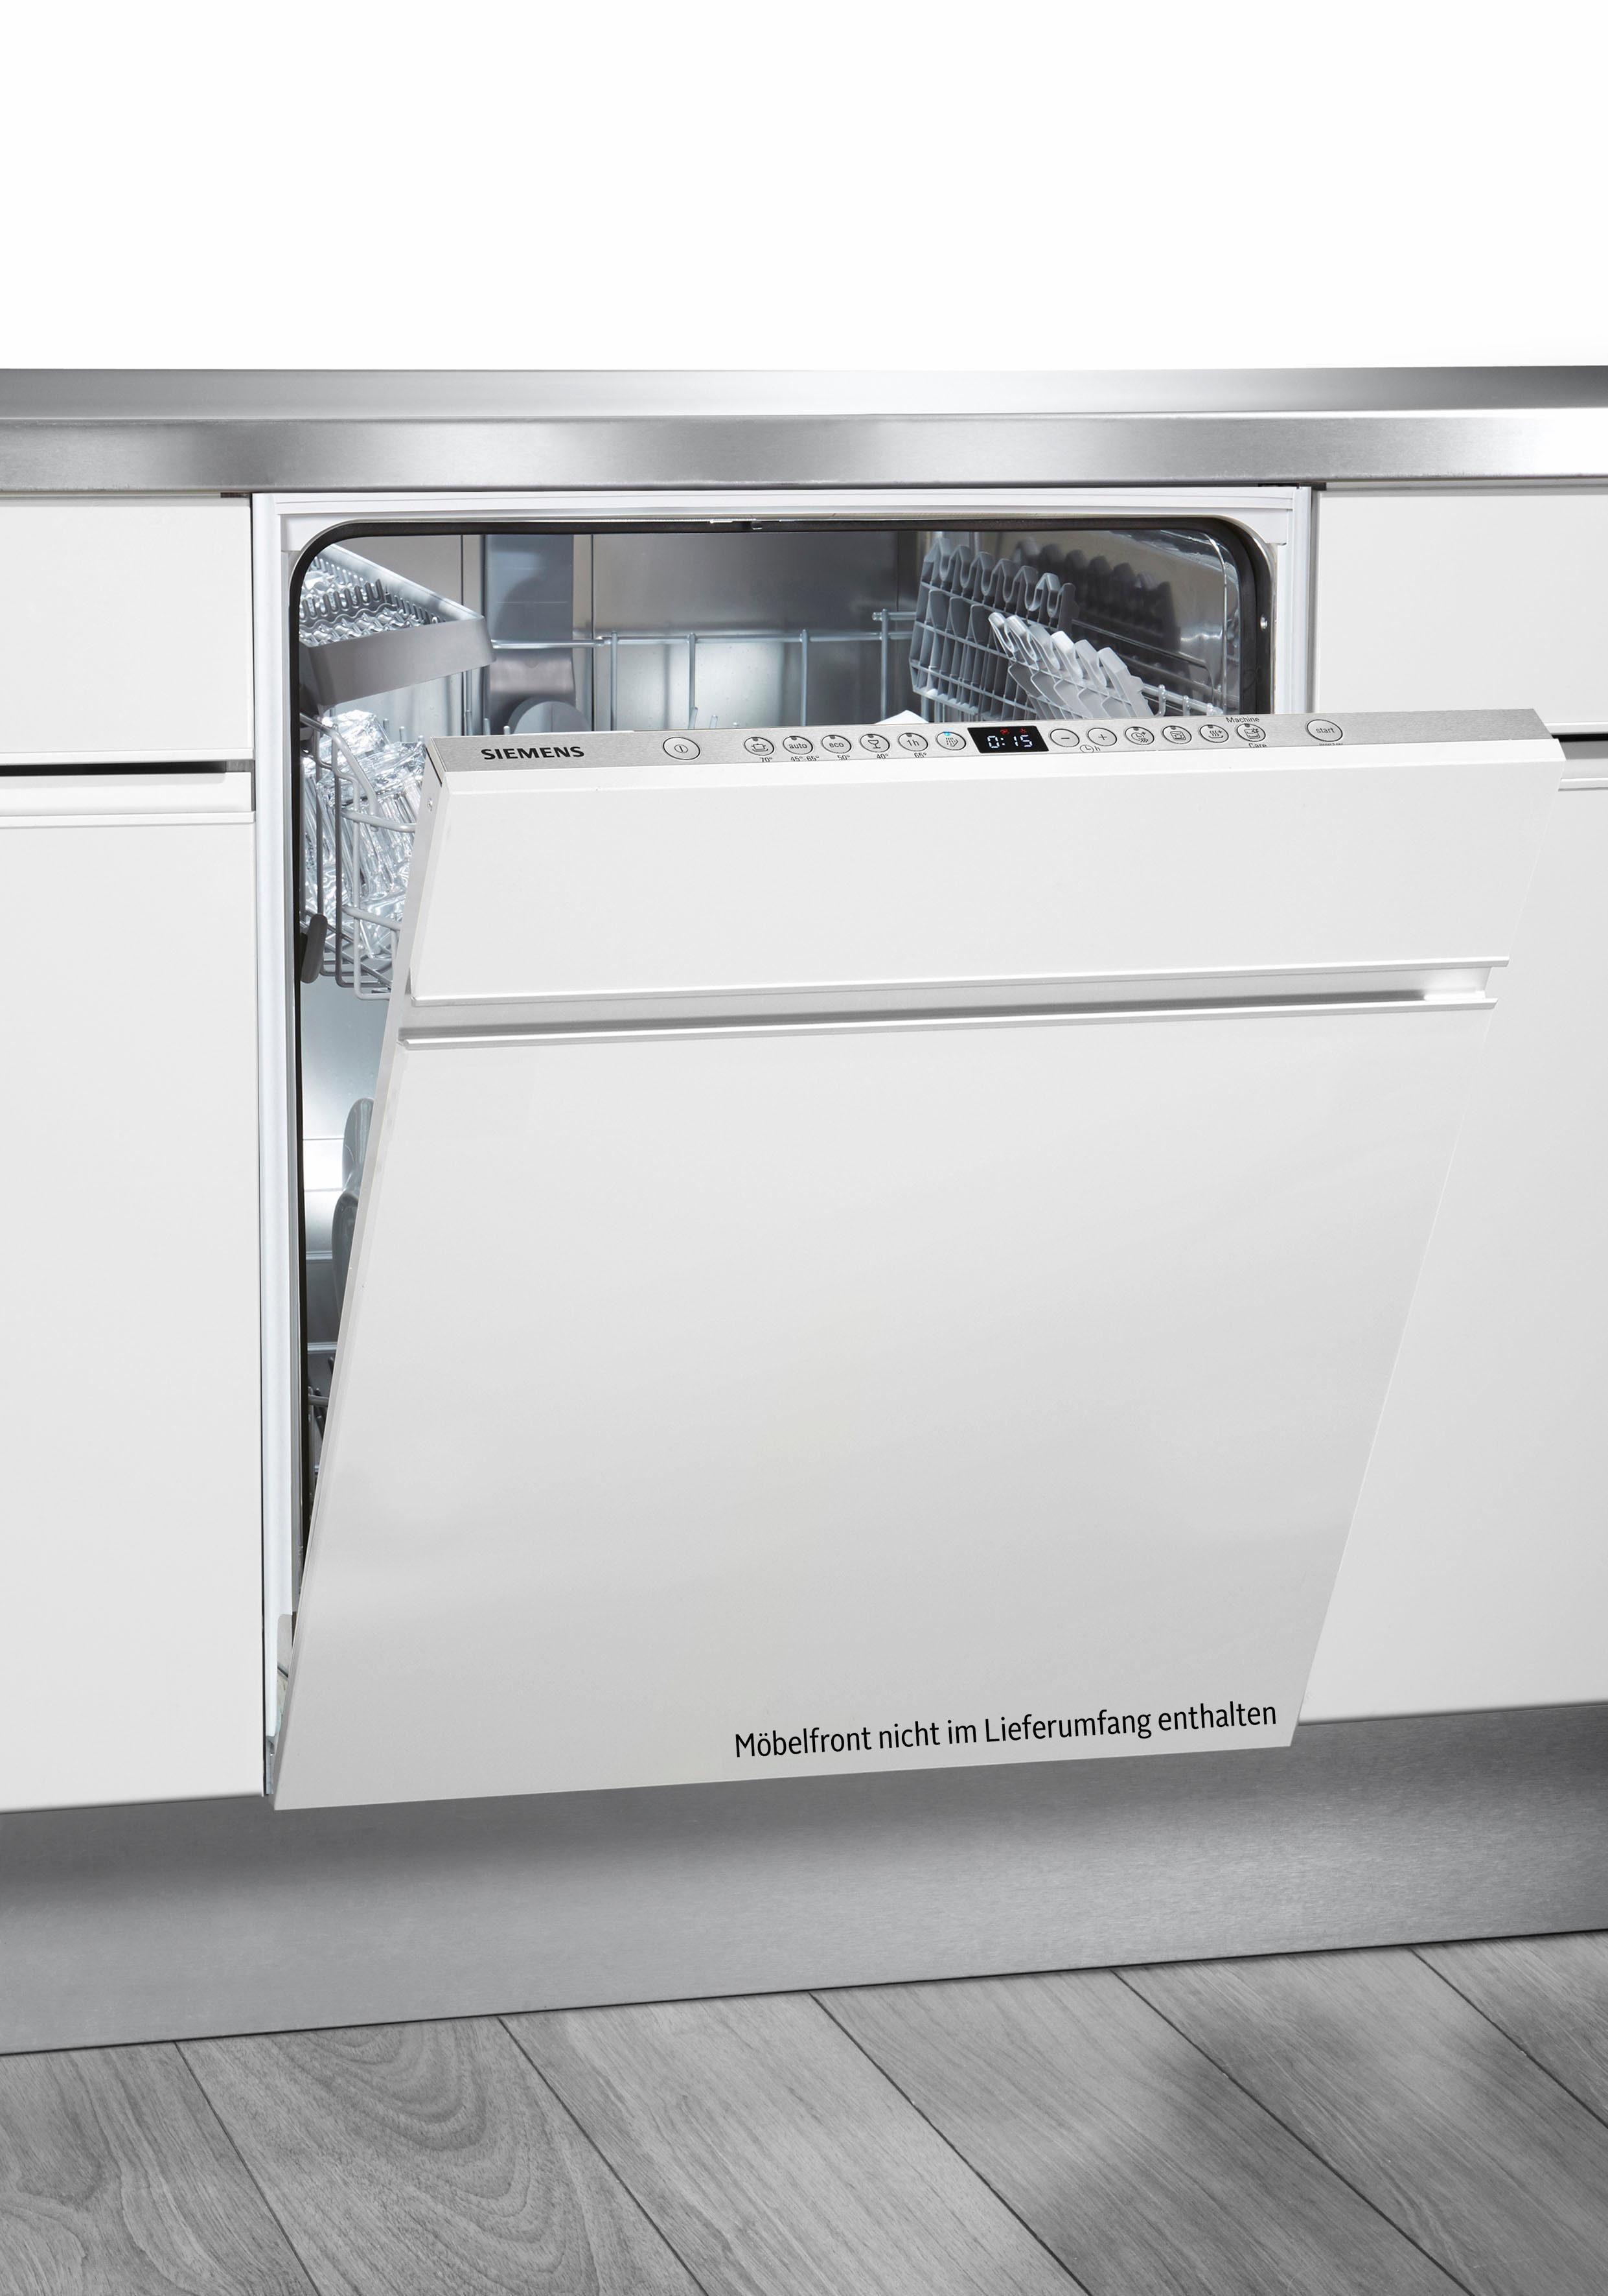 SIEMENS vollintegrierbarer Geschirrspüler iQ300, iQ300 SX636X03IE, 9,5 l, 13 Maßgedecke, Energieeffizienzklasse A++